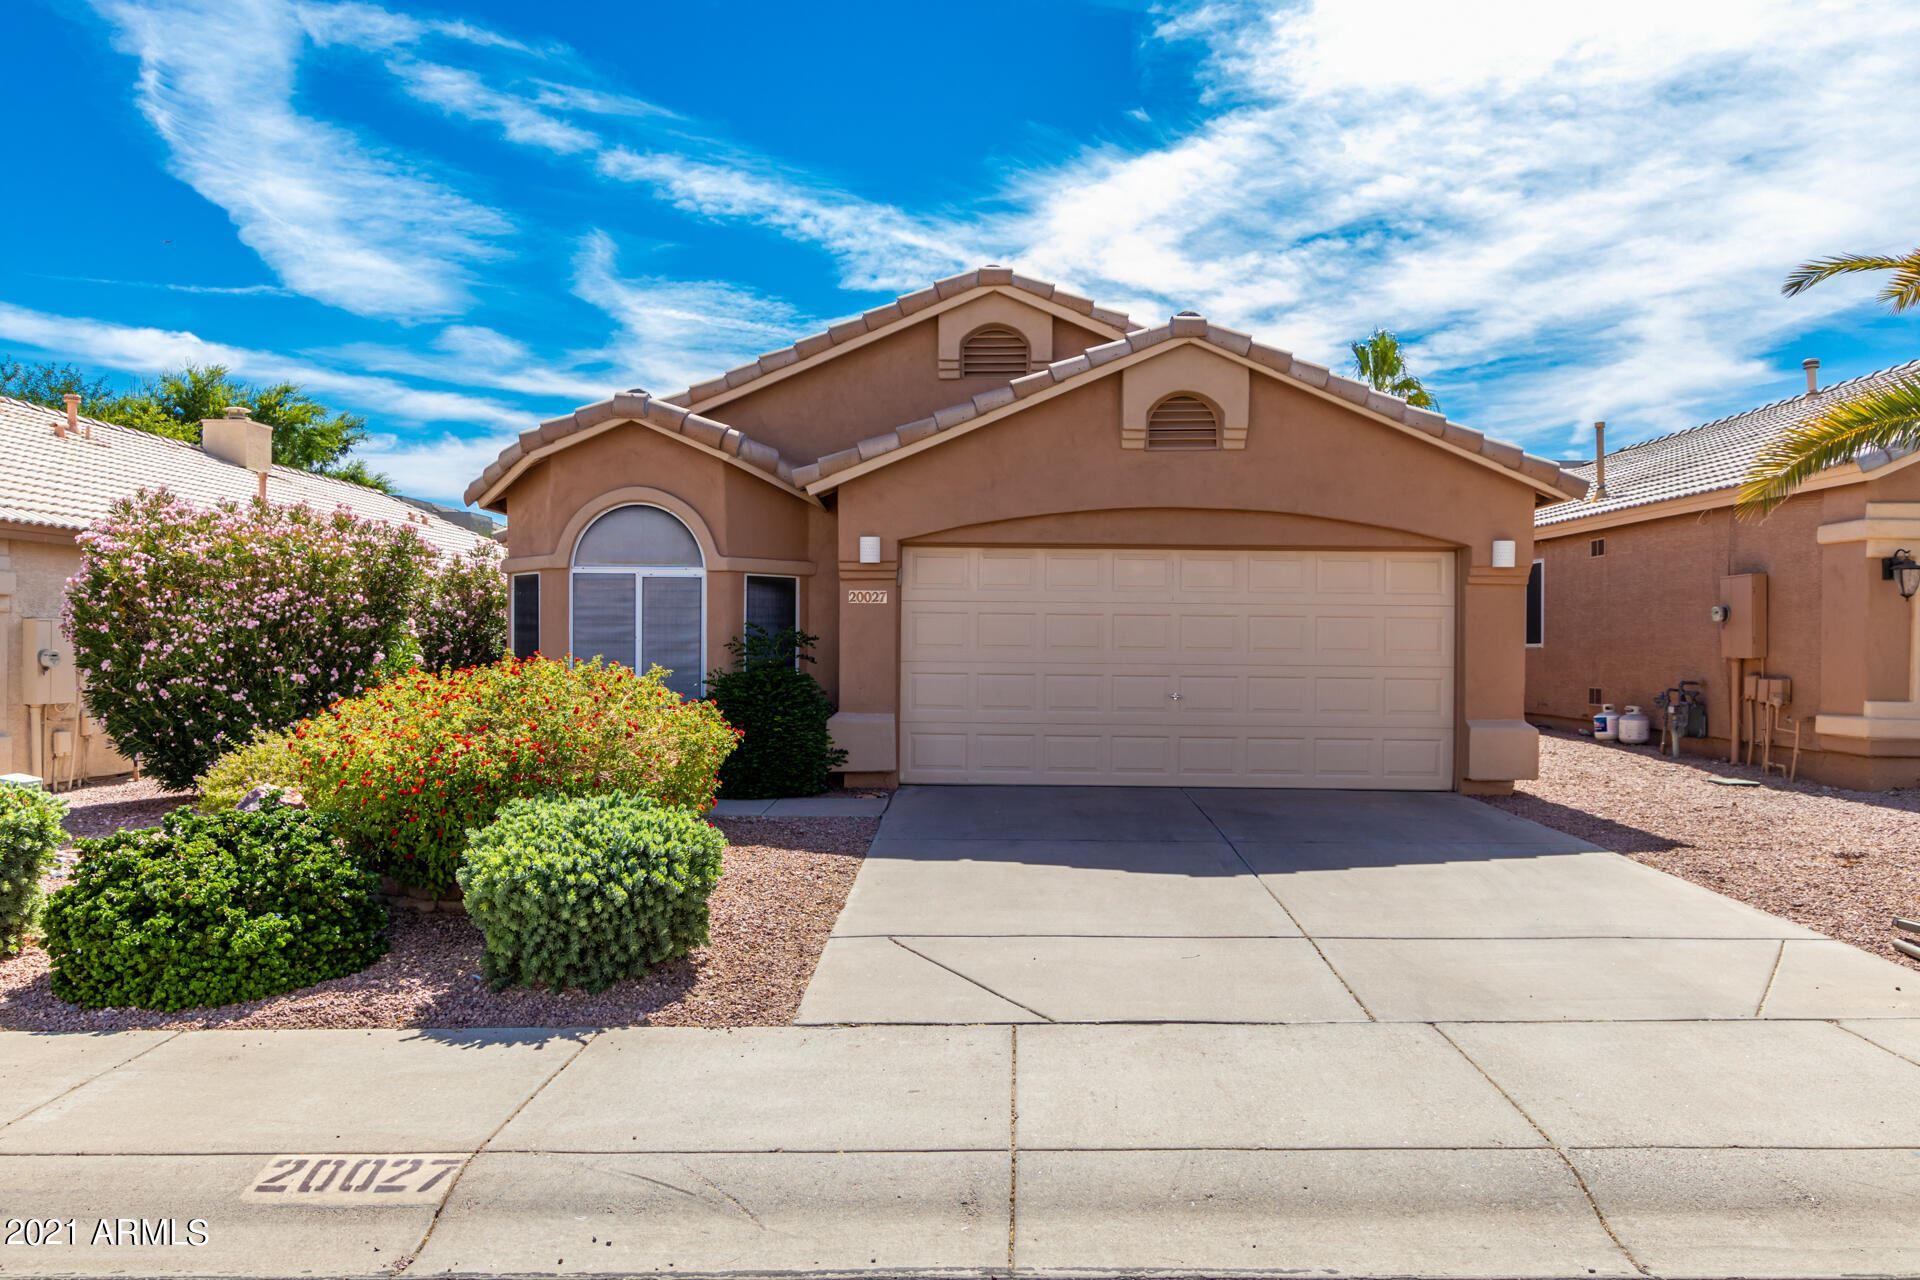 20027 N 22ND Place, Phoenix, AZ 85024 - MLS#: 6248790